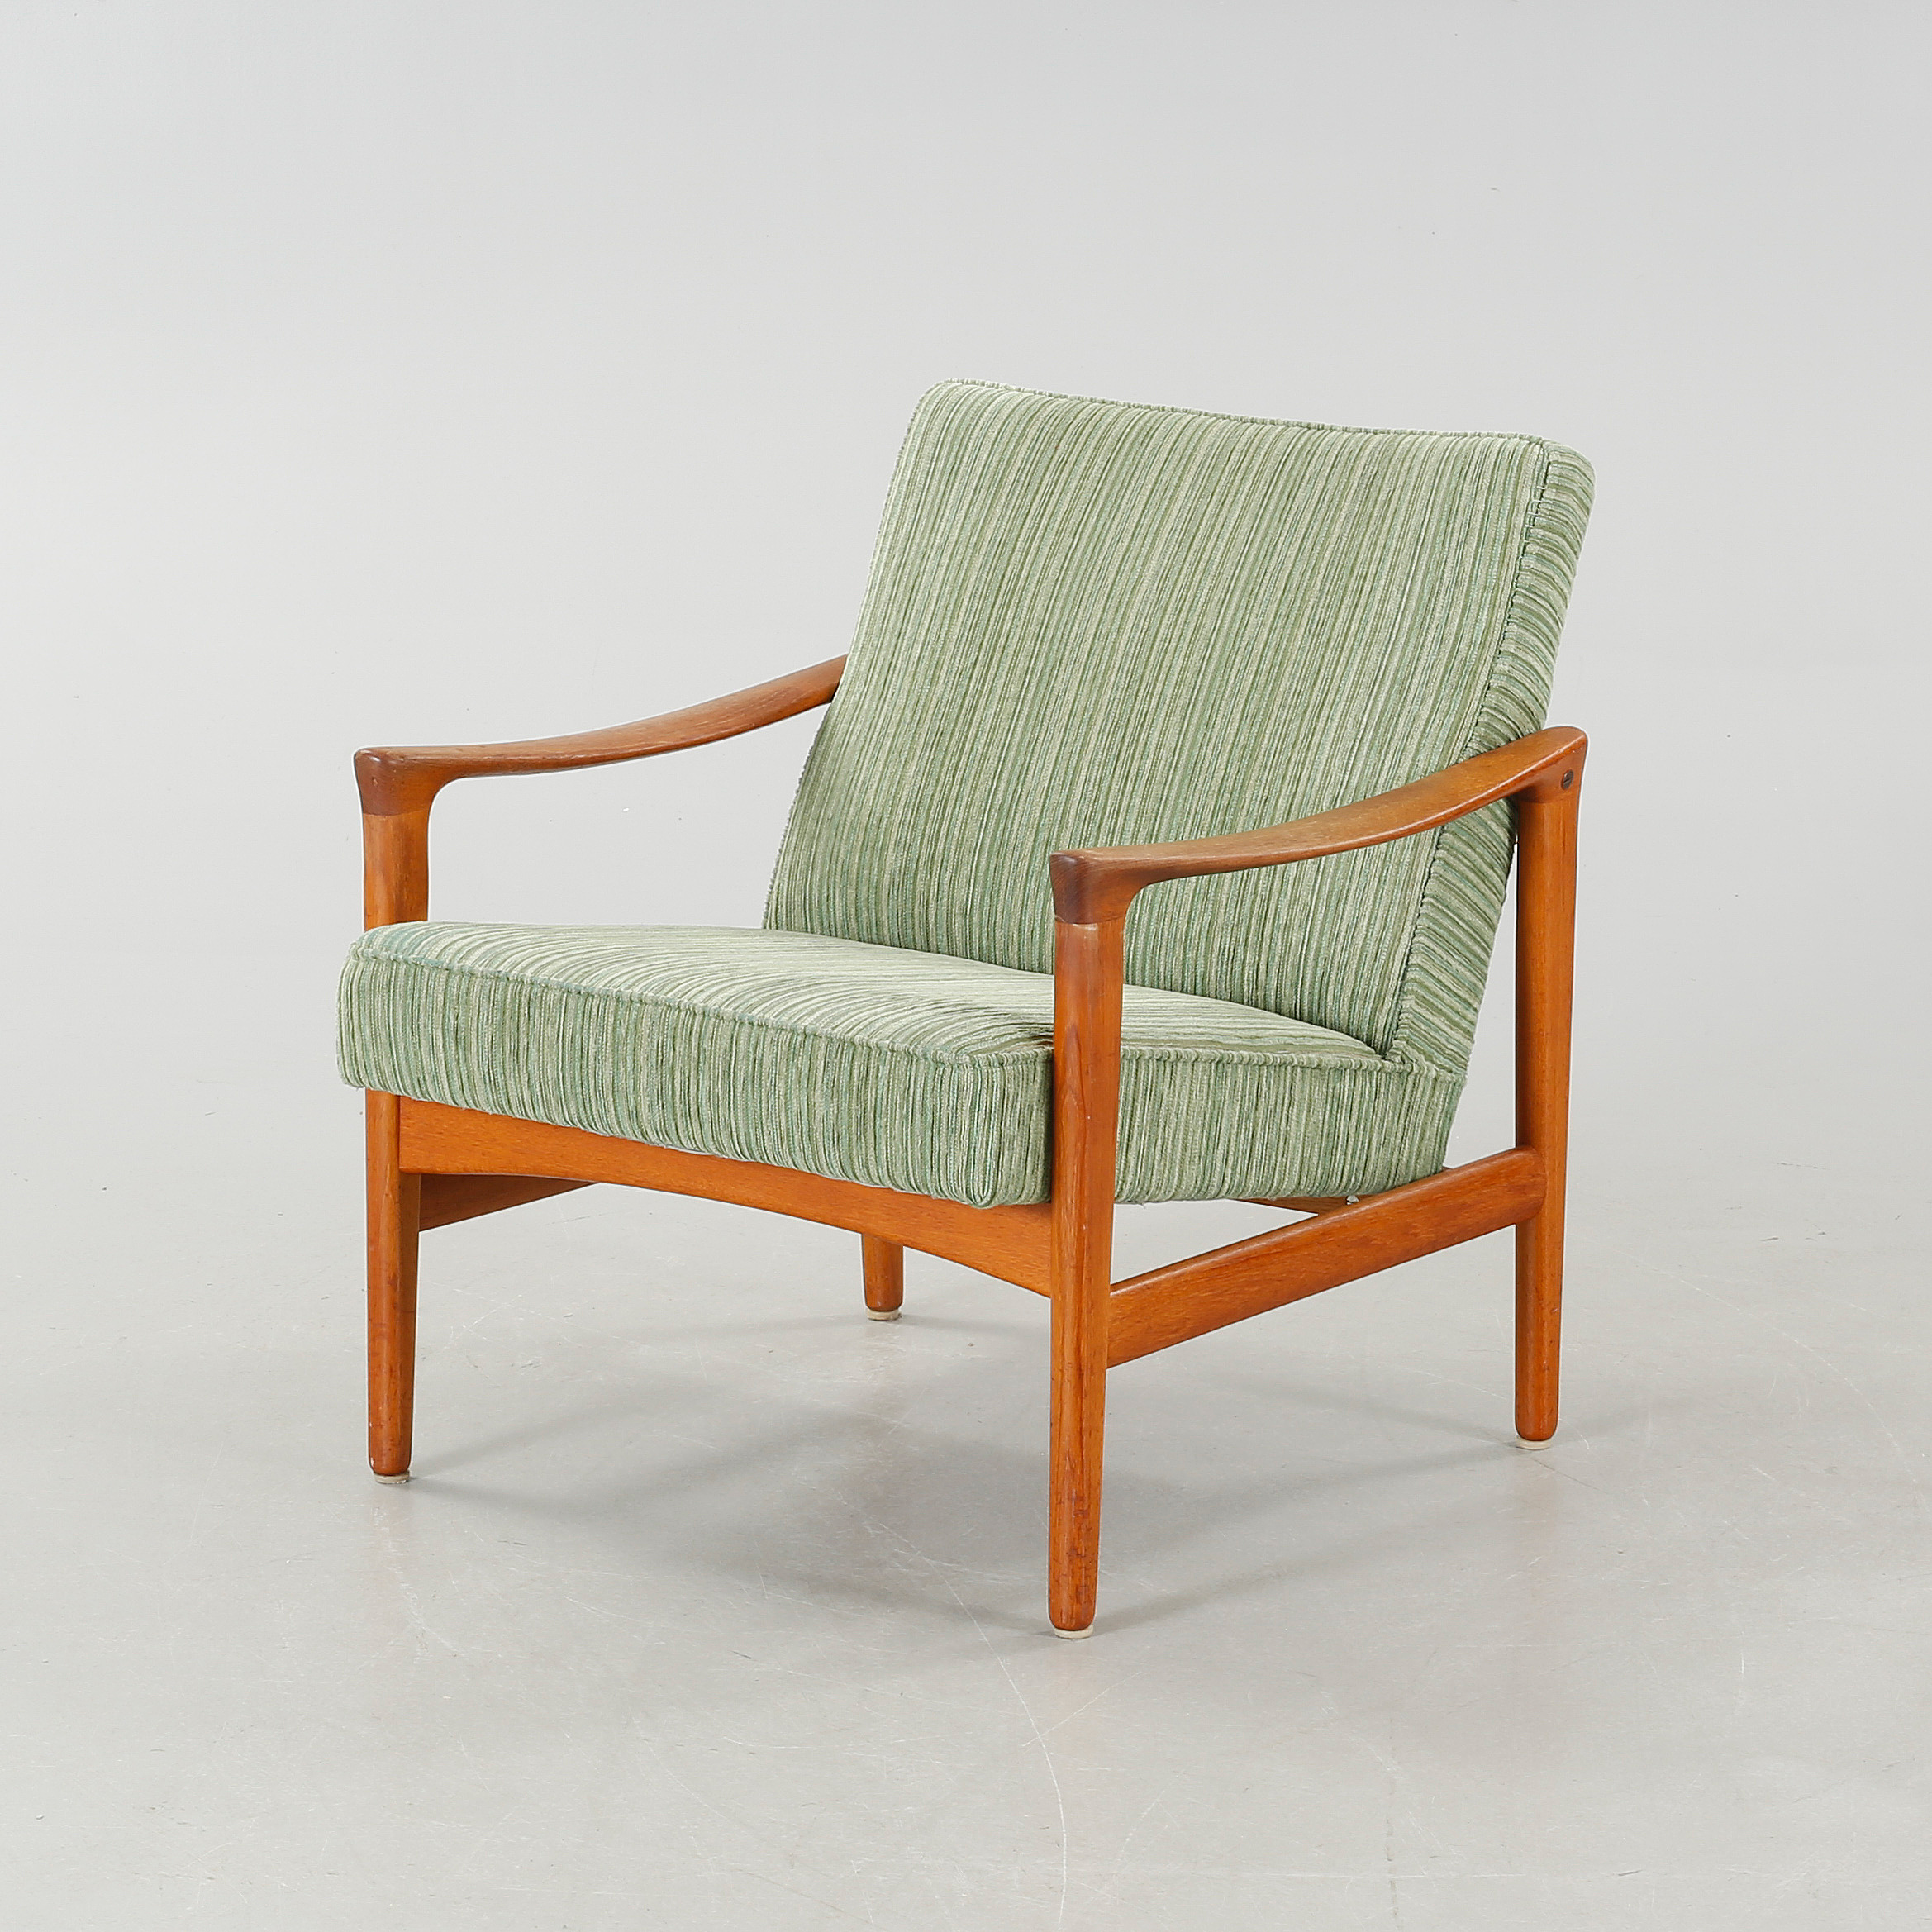 "INGE ANDERSSON, fåtölj,""Oslo"", Bröderna Andersson, Ekenässjön, modell formgiven 1960 Bukowskis"